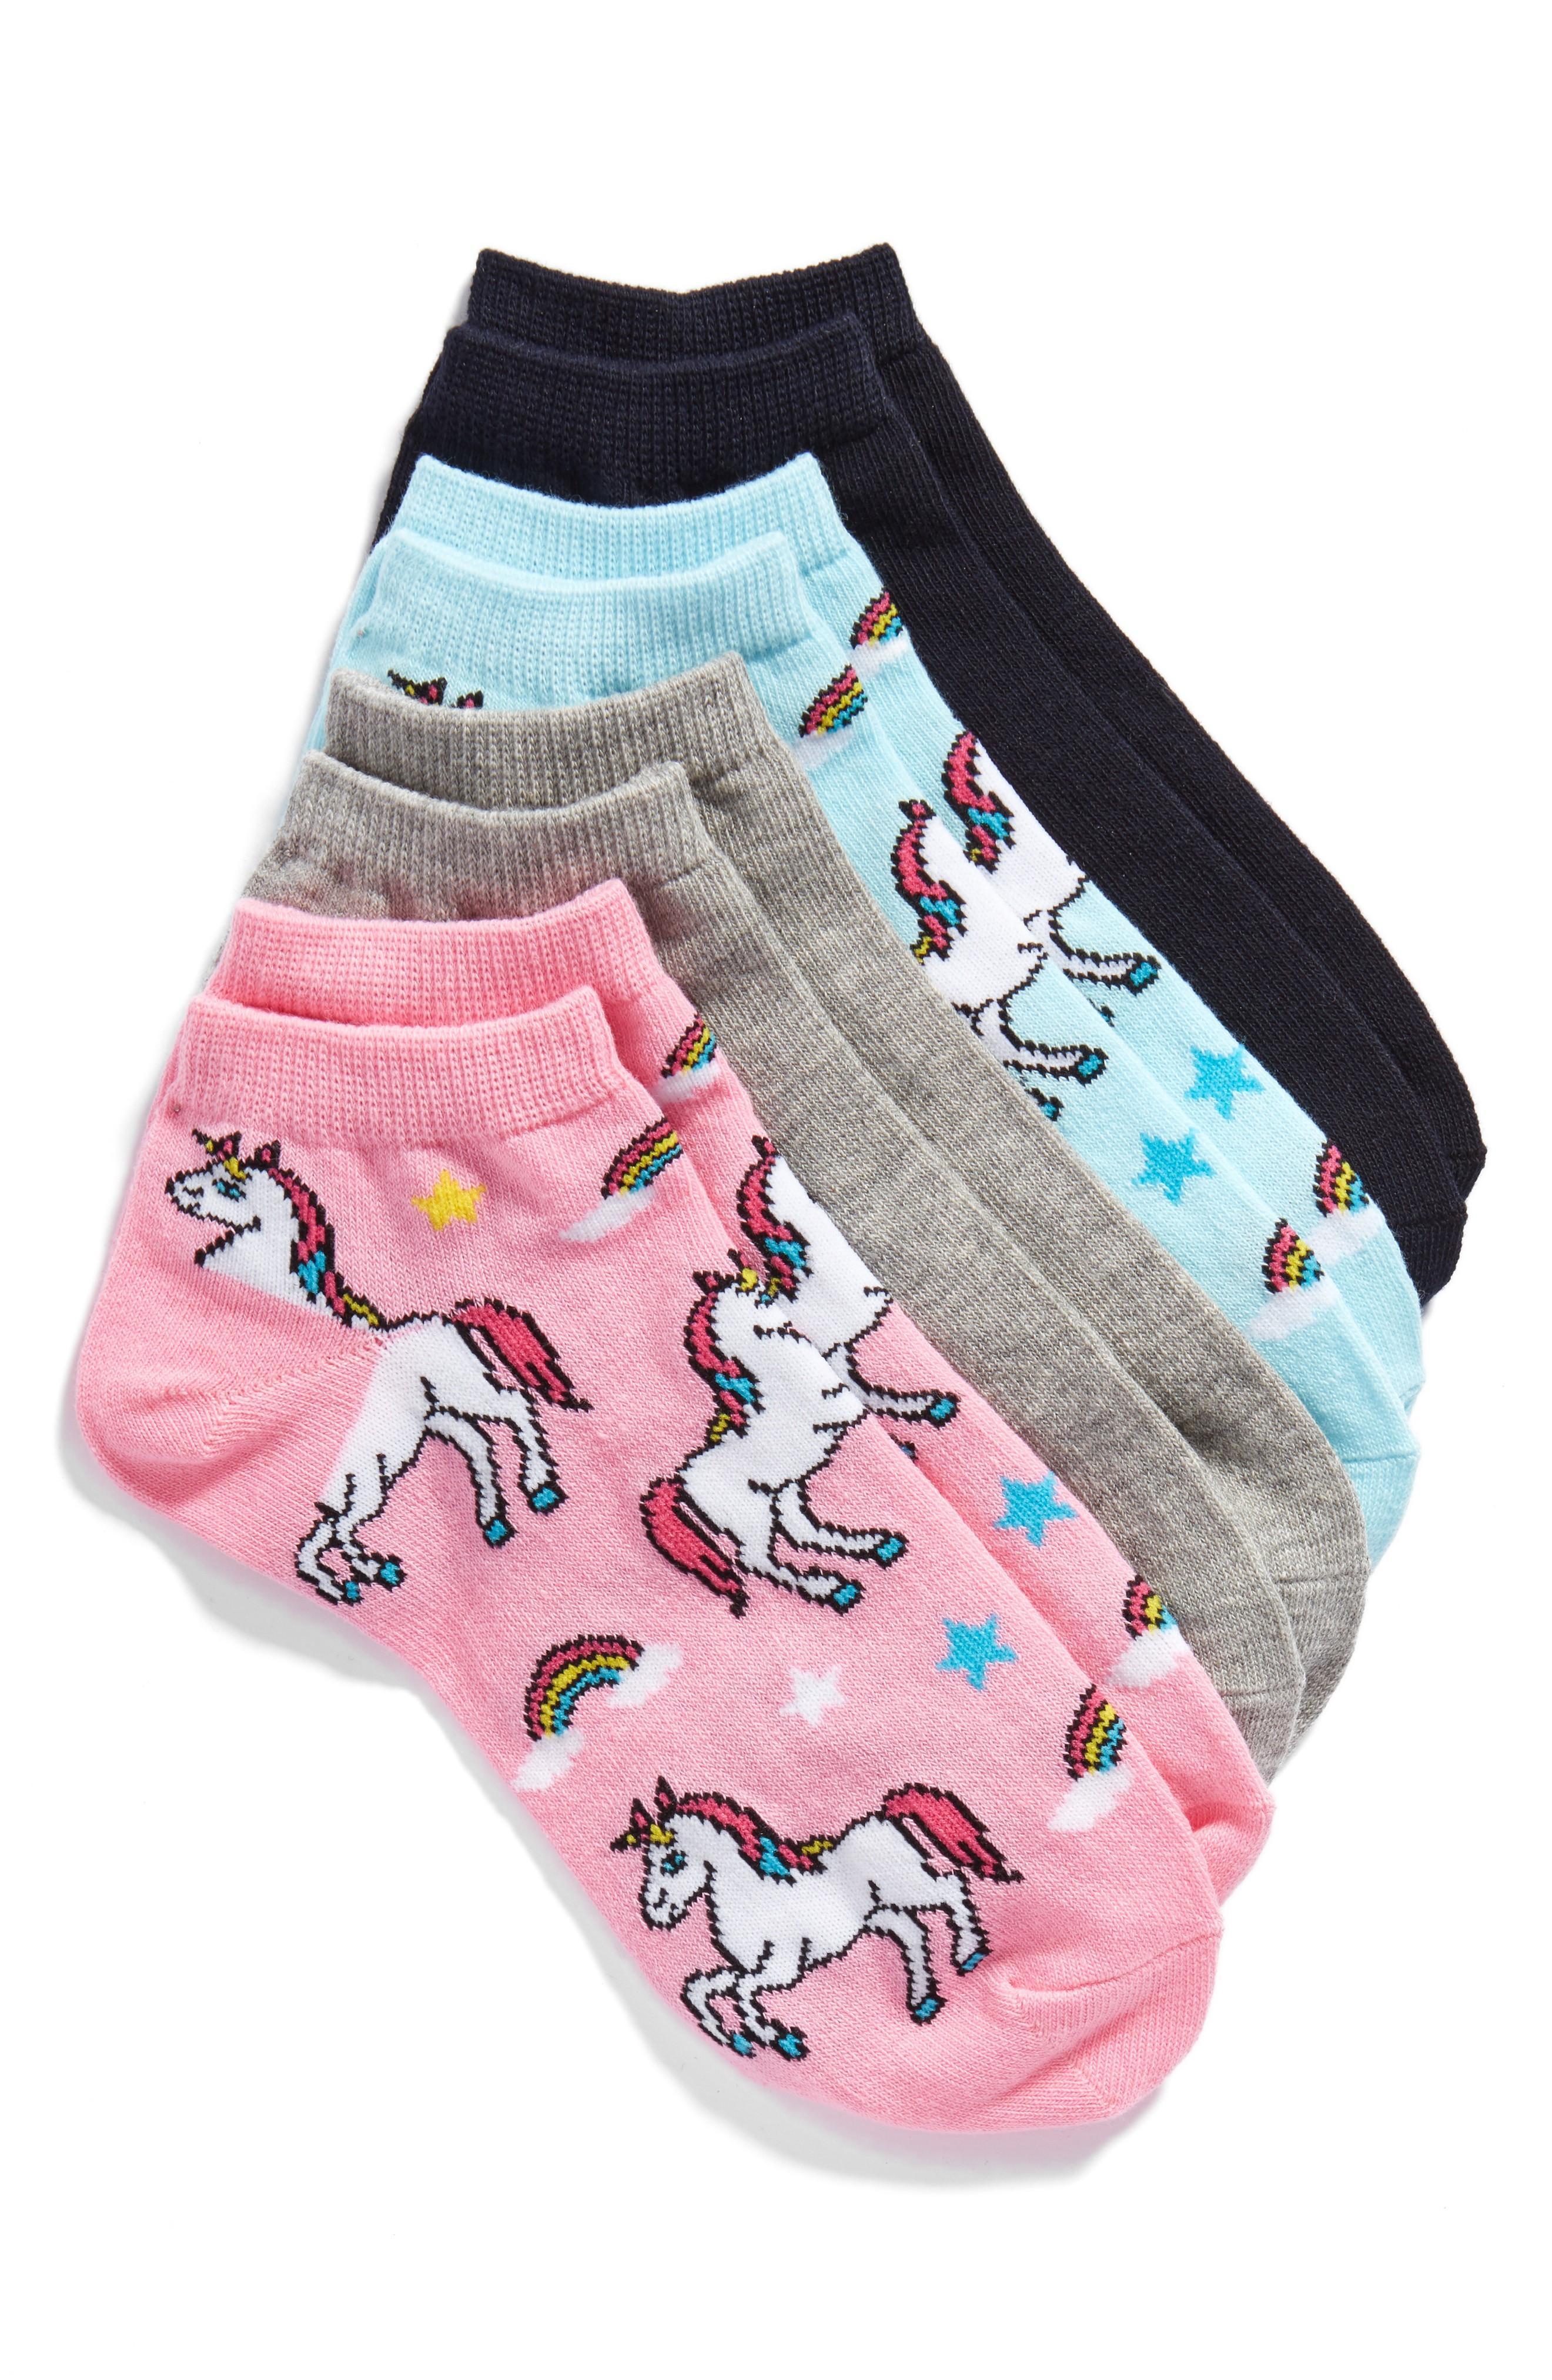 Sockart Unicorn 4-pack Ankle Socks In Pink